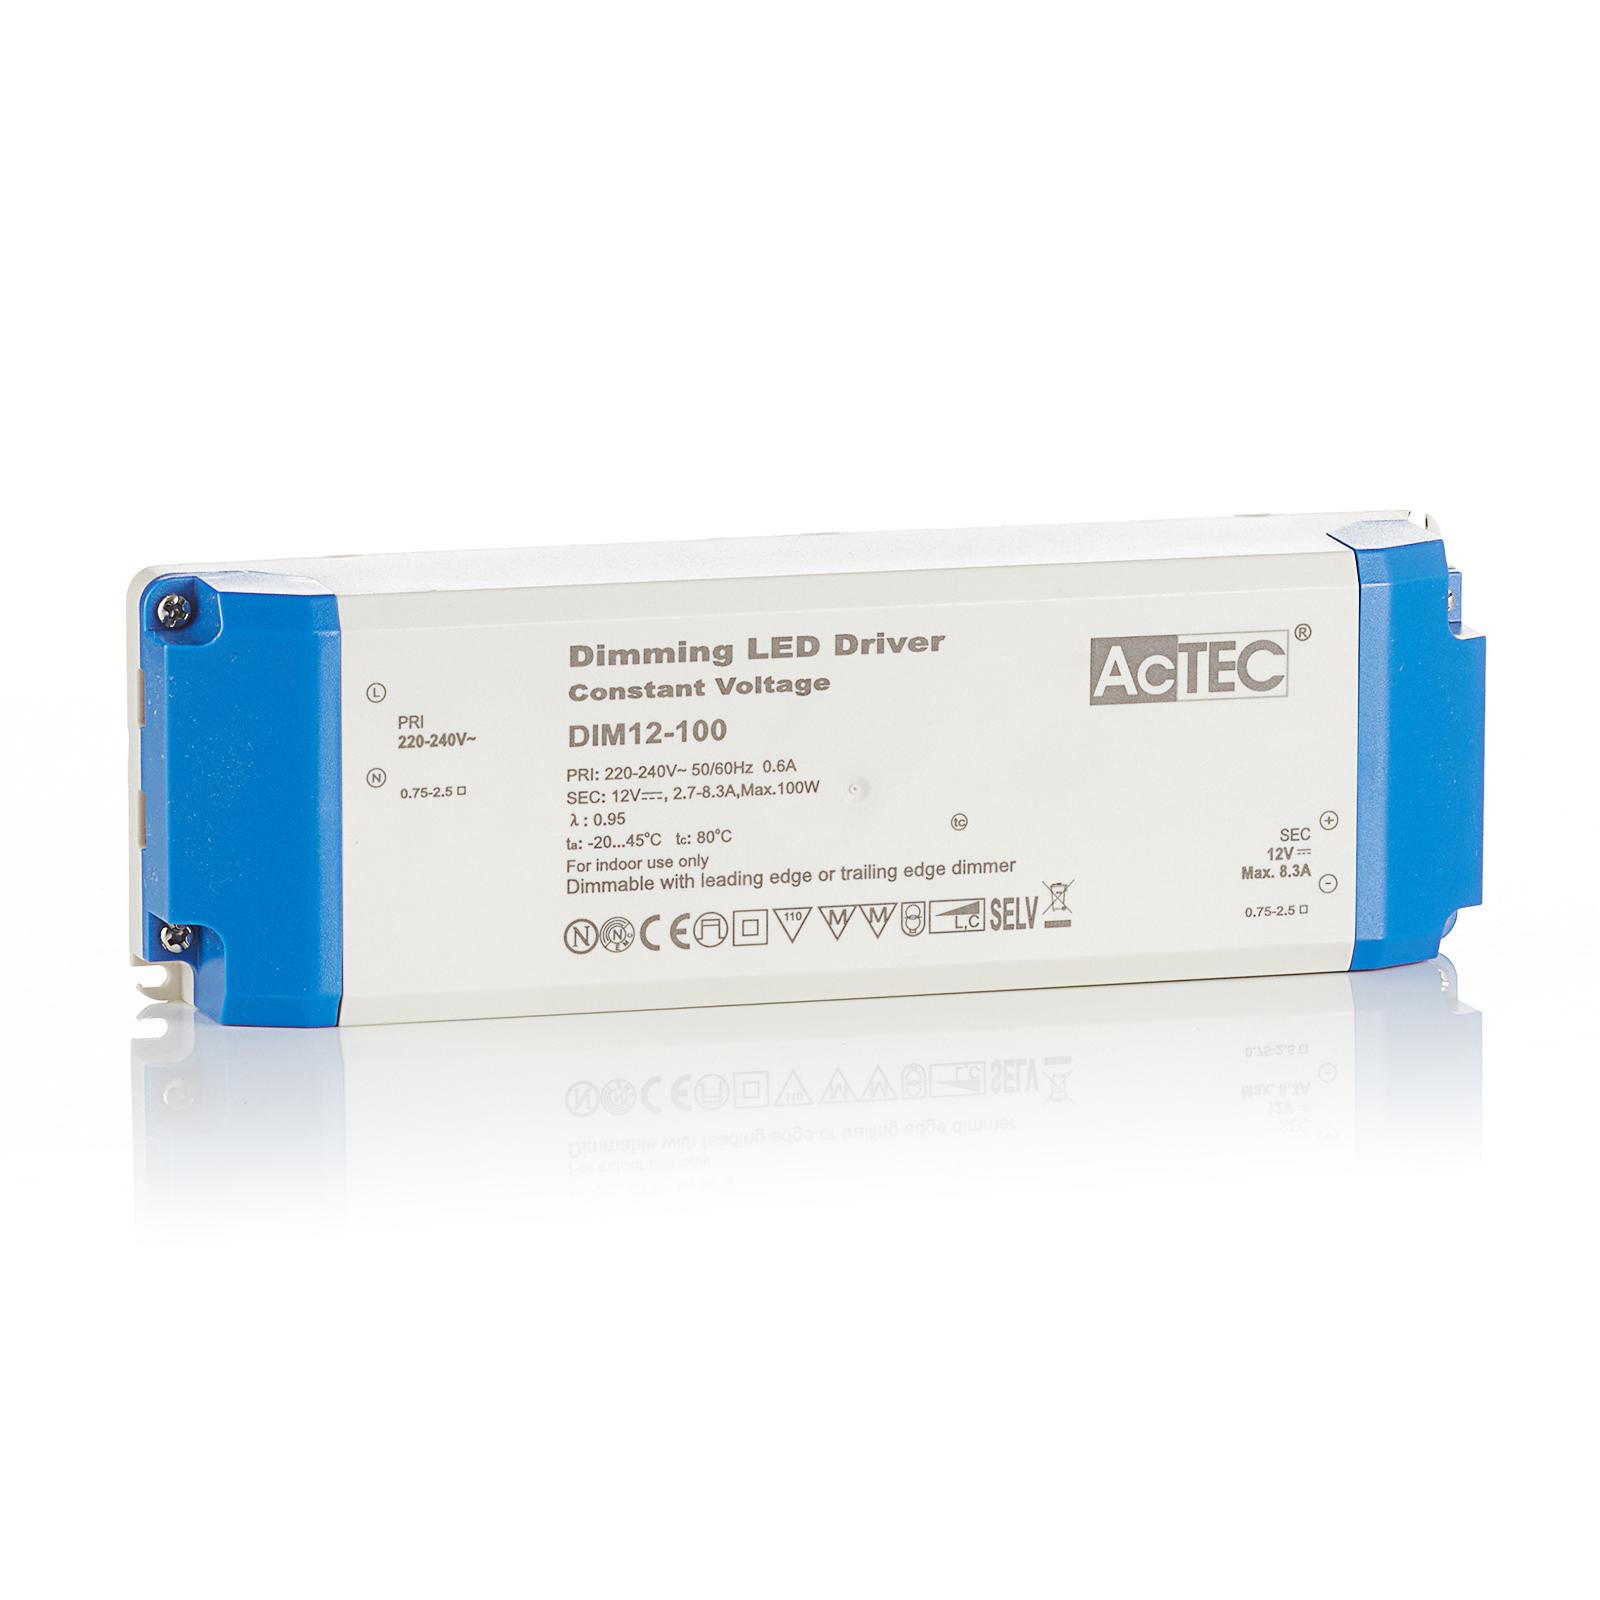 AcTEC DIM LED-Treiber CV 12V, 100W, dimmbar